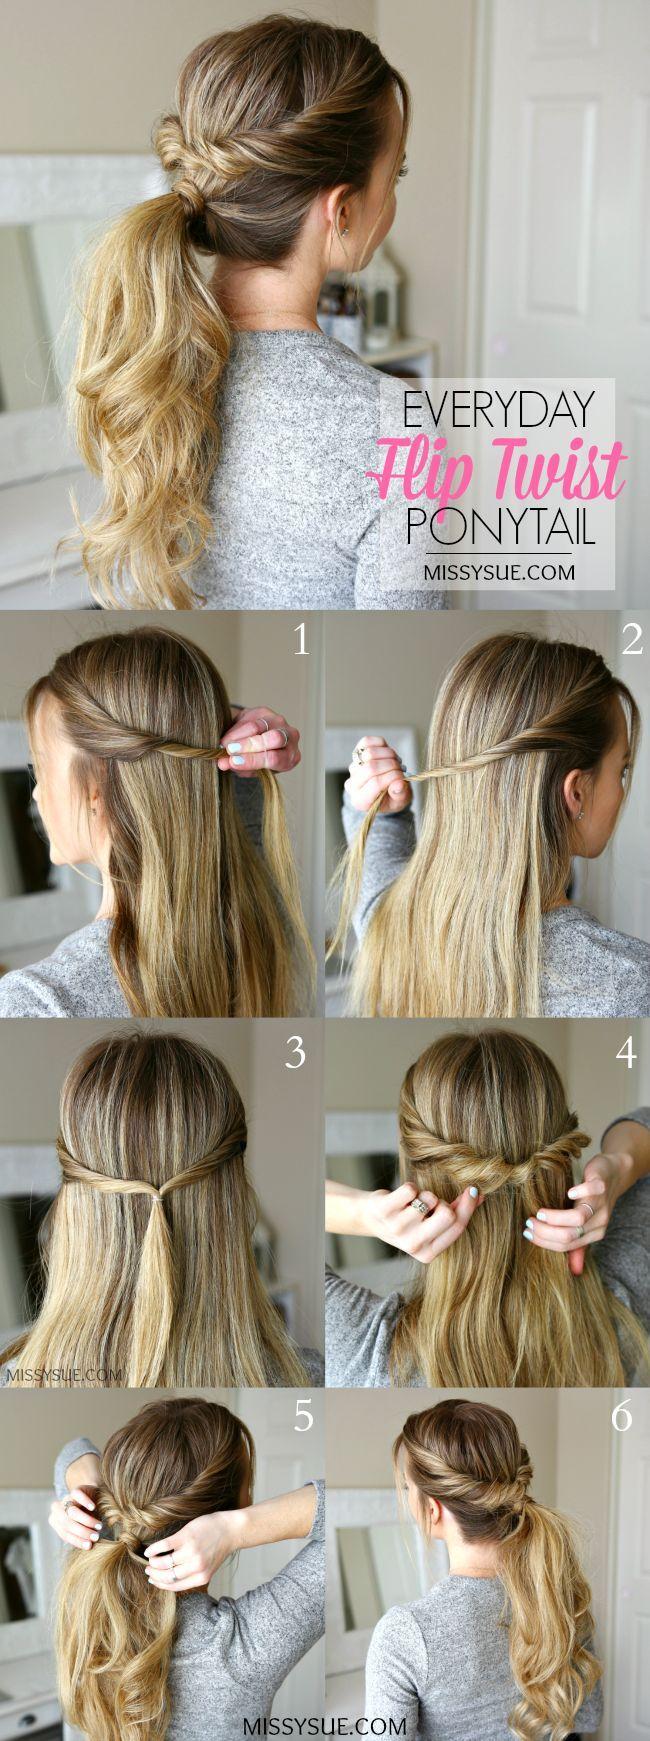 easy u cute hairstyles for summers hair pinterest ponytail